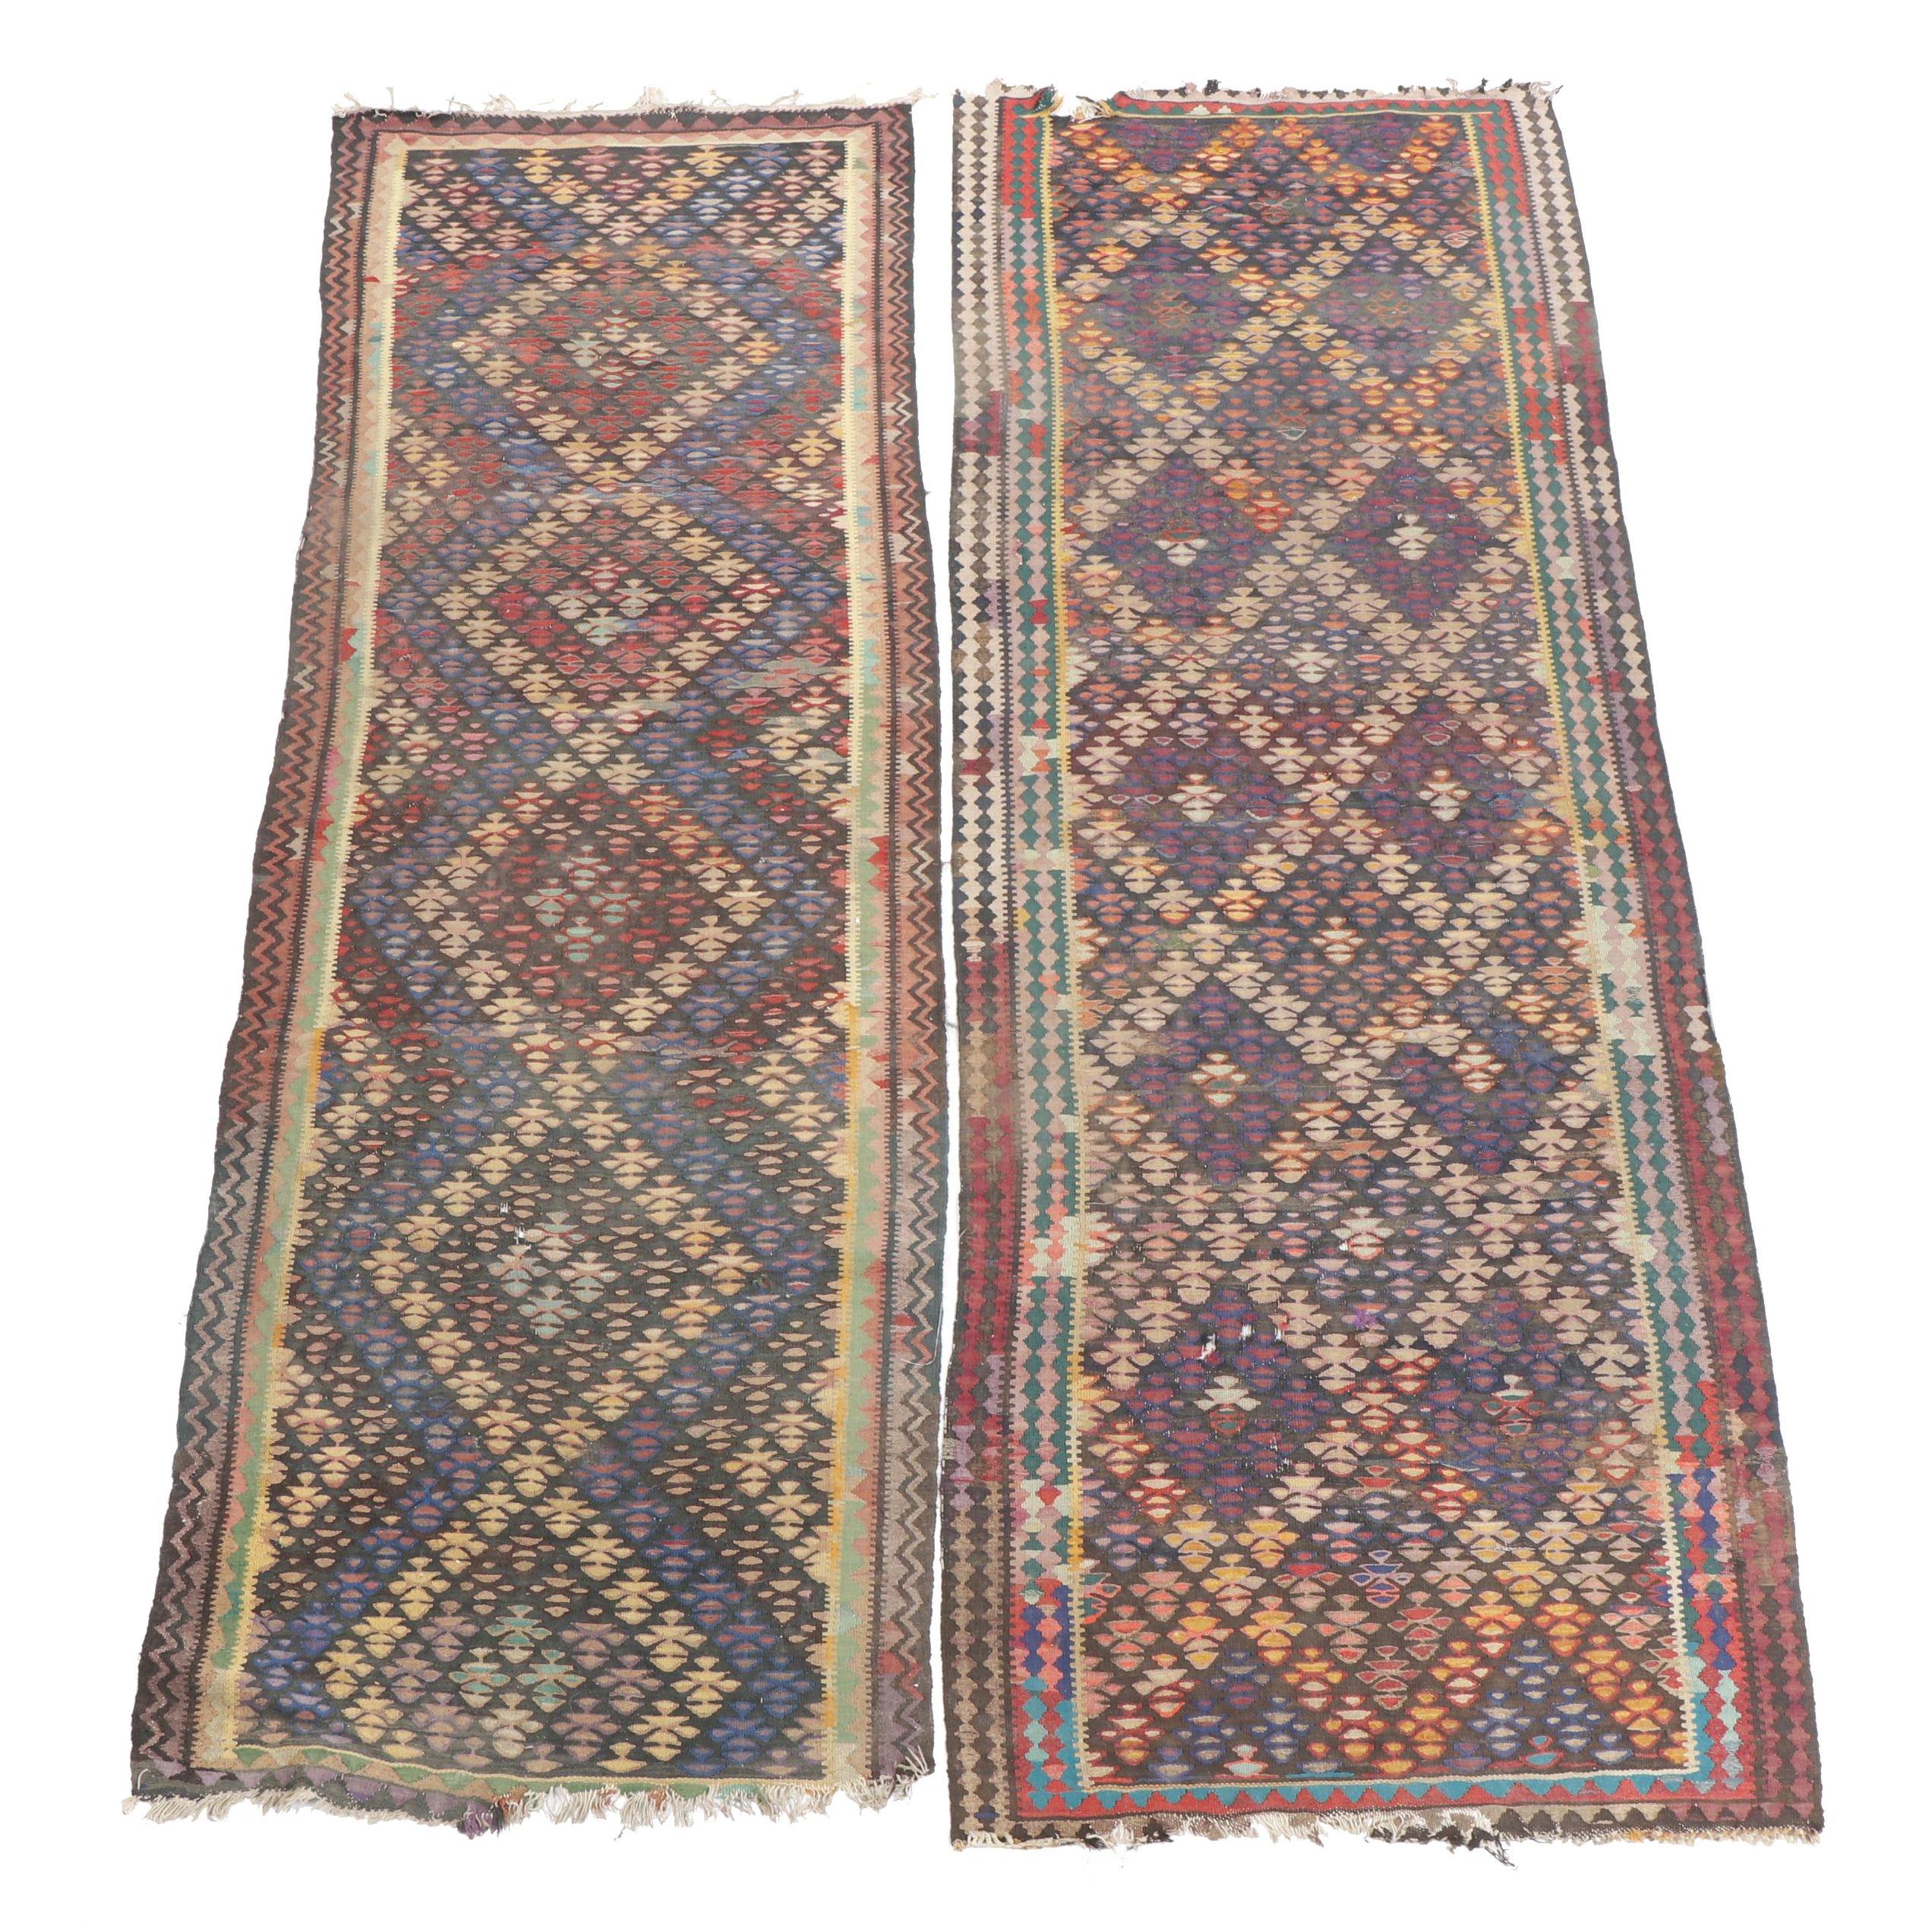 Handwoven Anatolian Wool Long Rugs